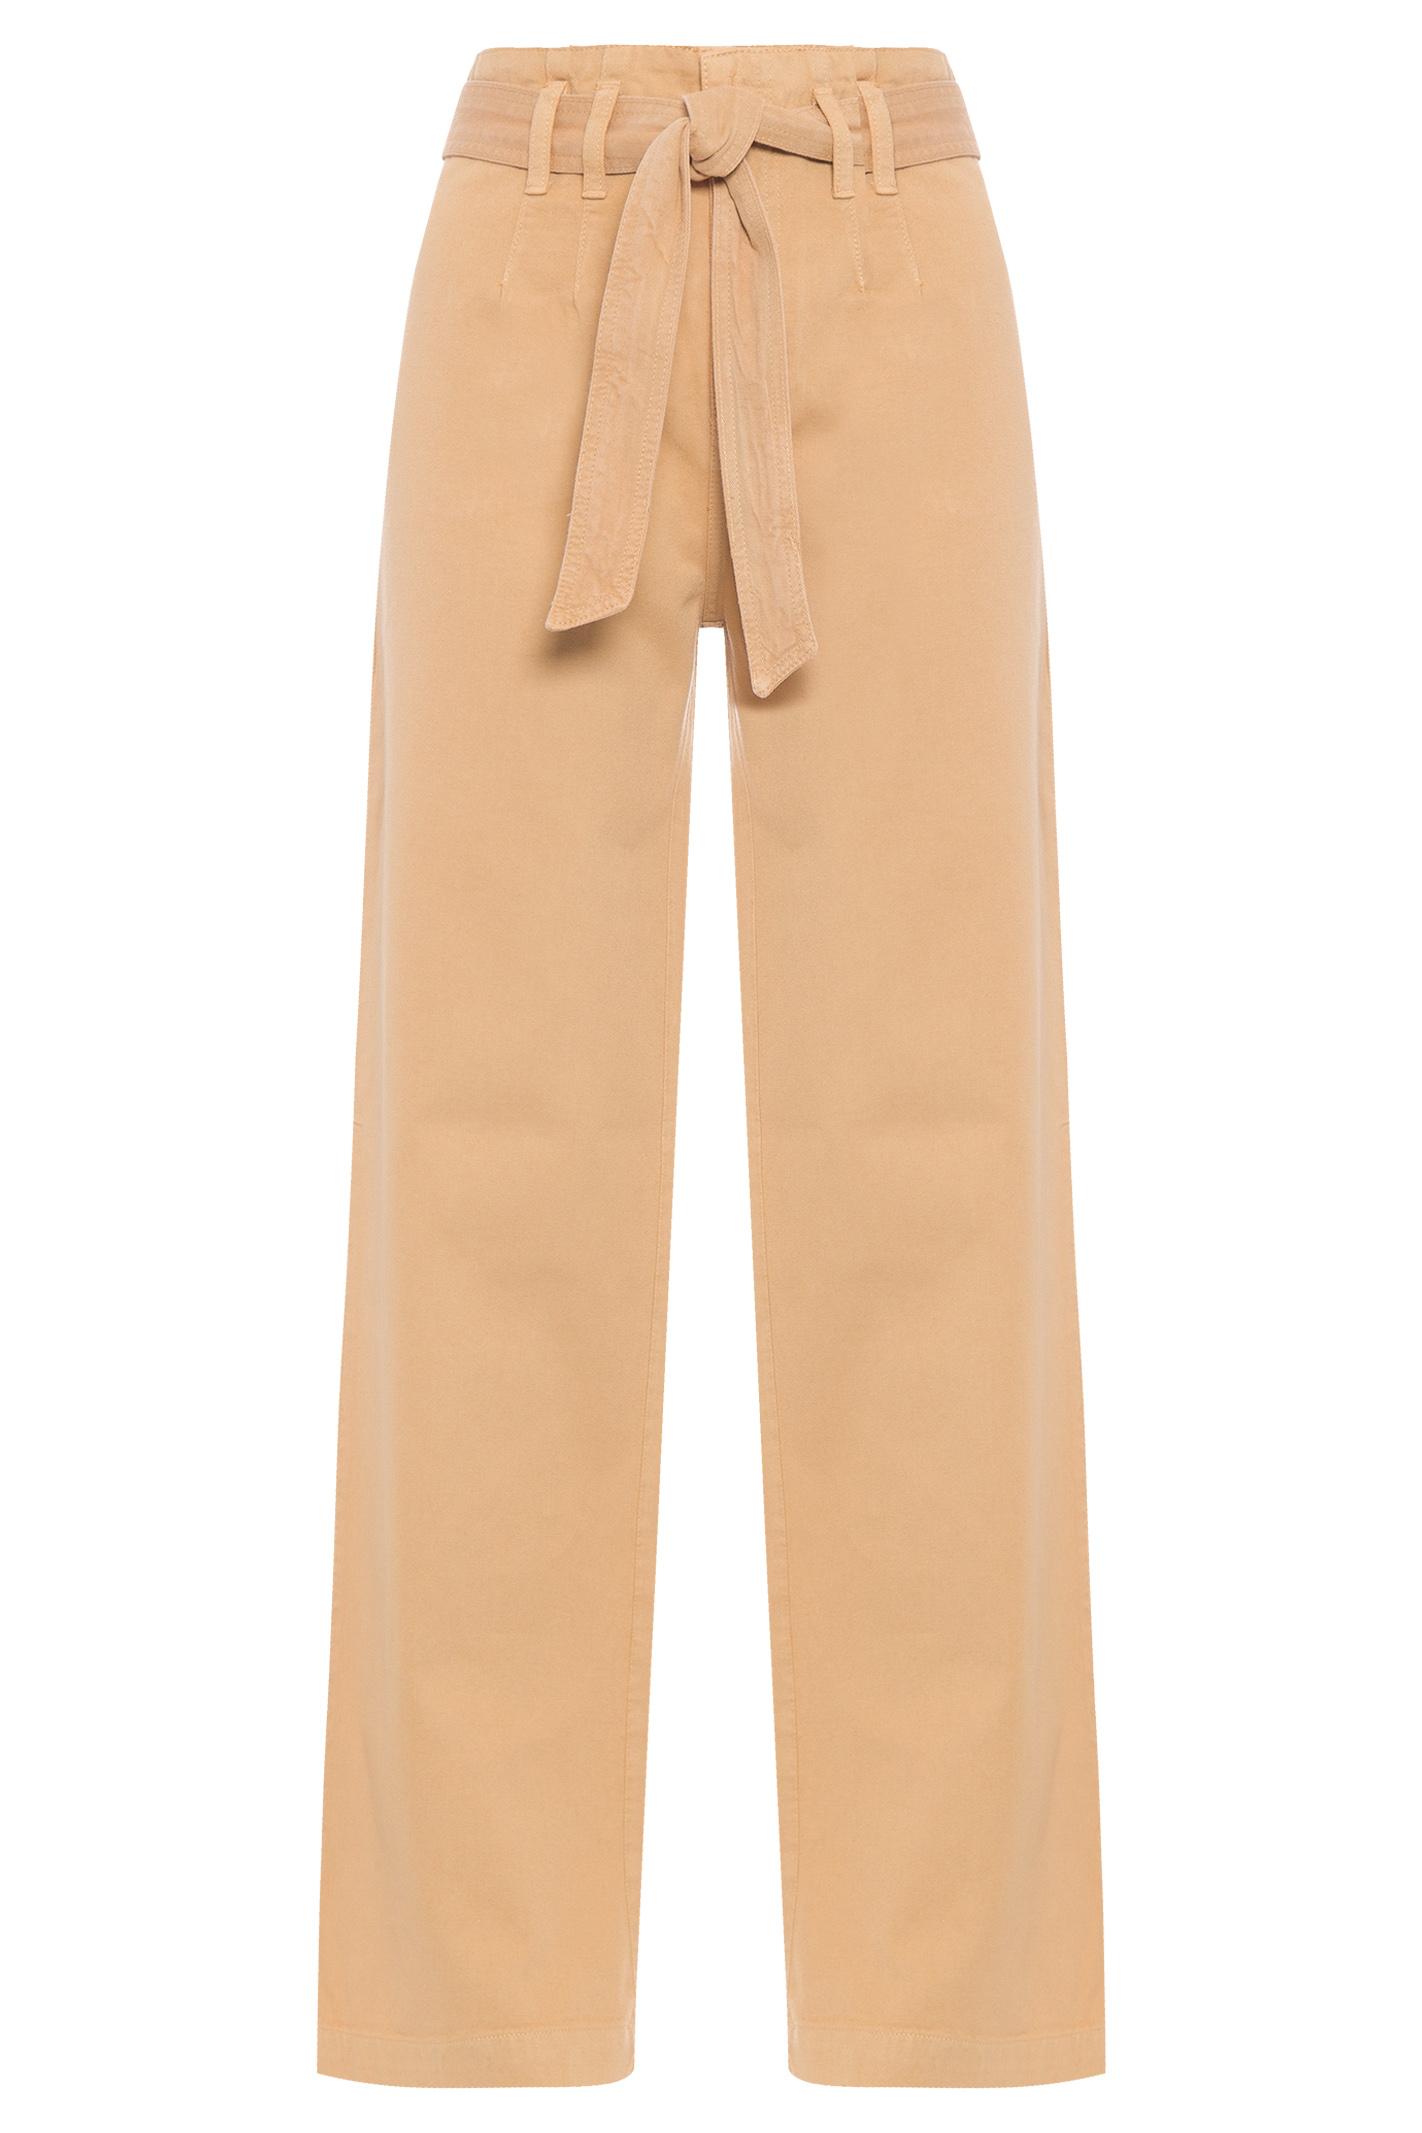 Calca Sarja A Pantalona Pences